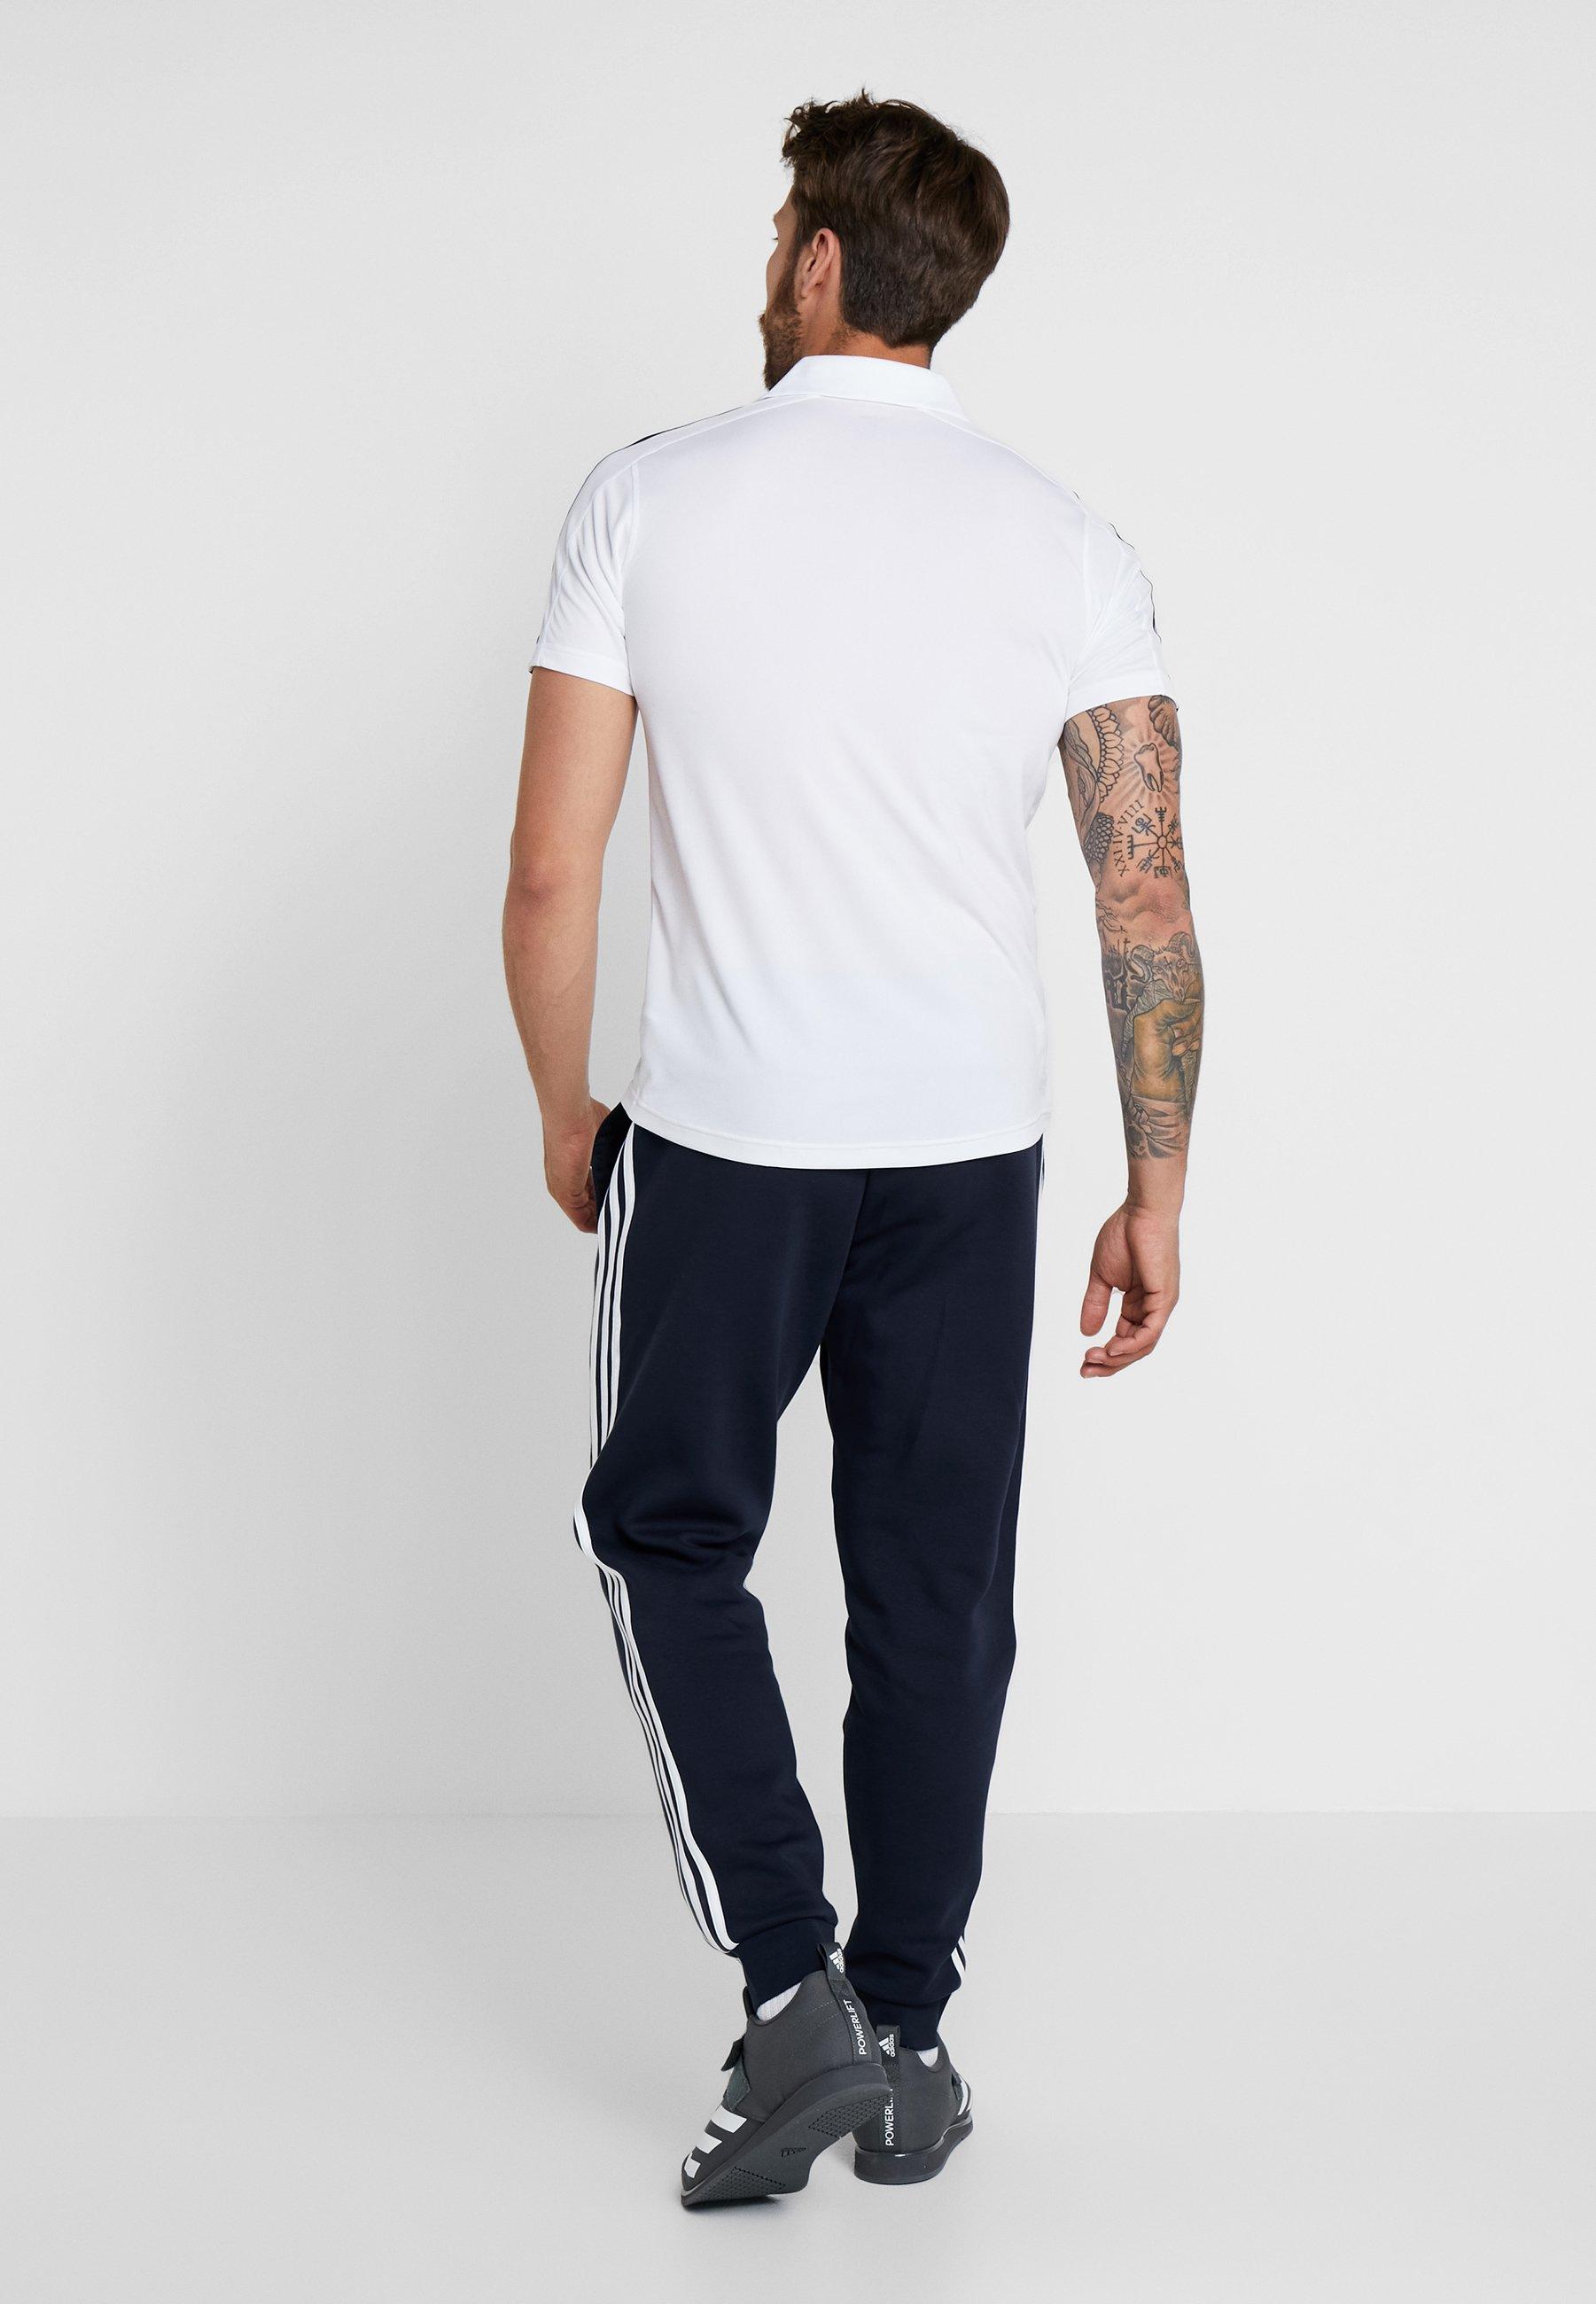 SurvêtementLegend Adidas Pantalon Ink white Performance De hdsCtQr